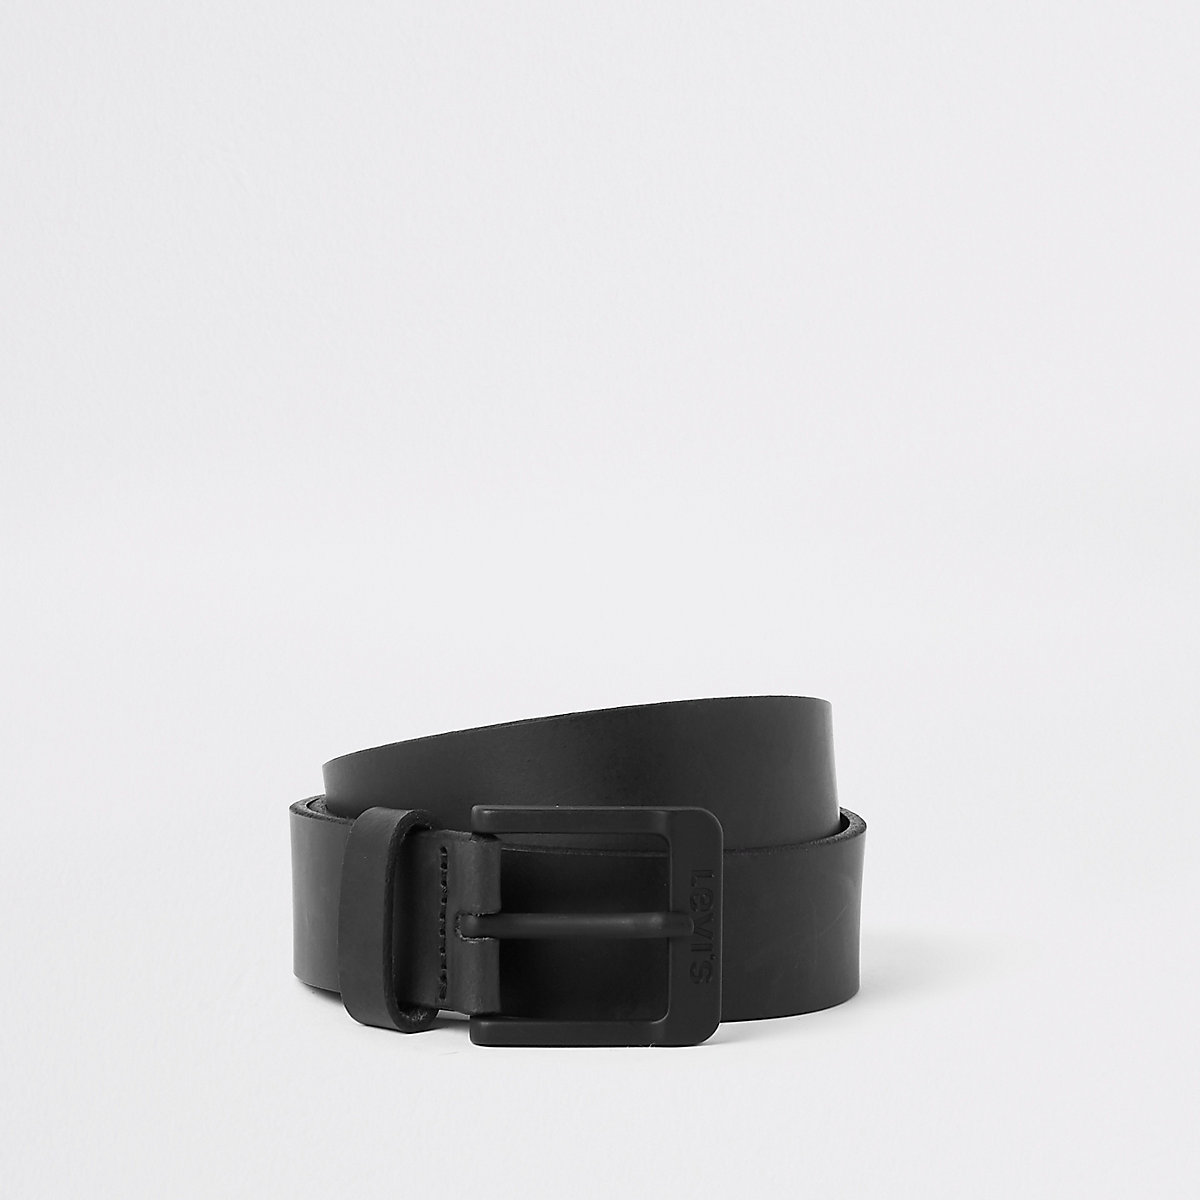 Levi's black buckle leather belt